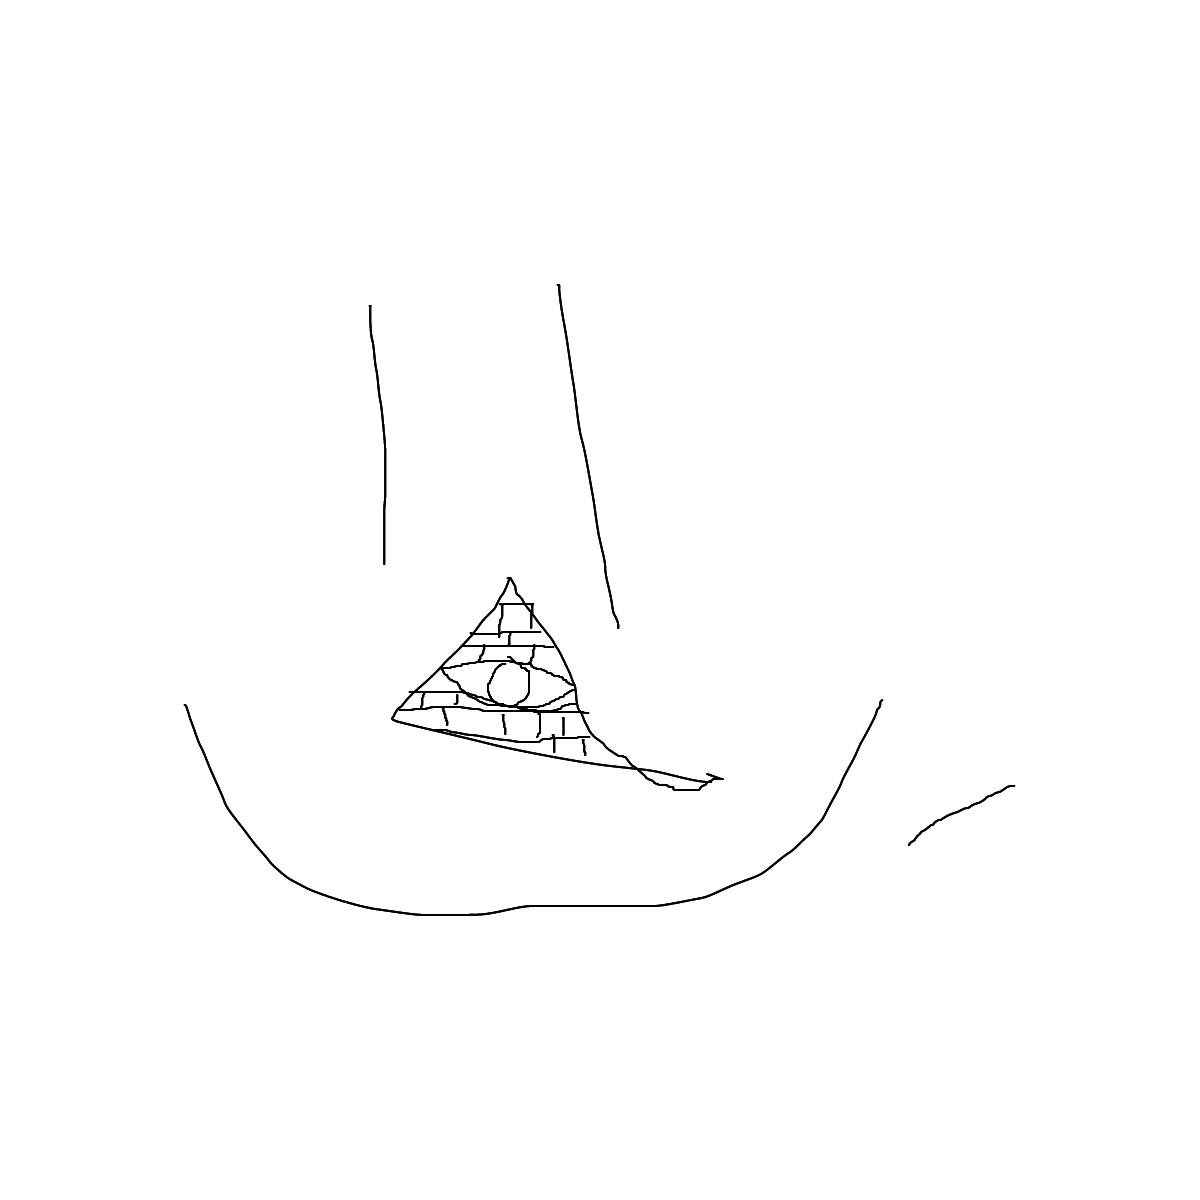 BAAAM drawing#326 lat:50.5301589965820300lng: -3.5856878757476807